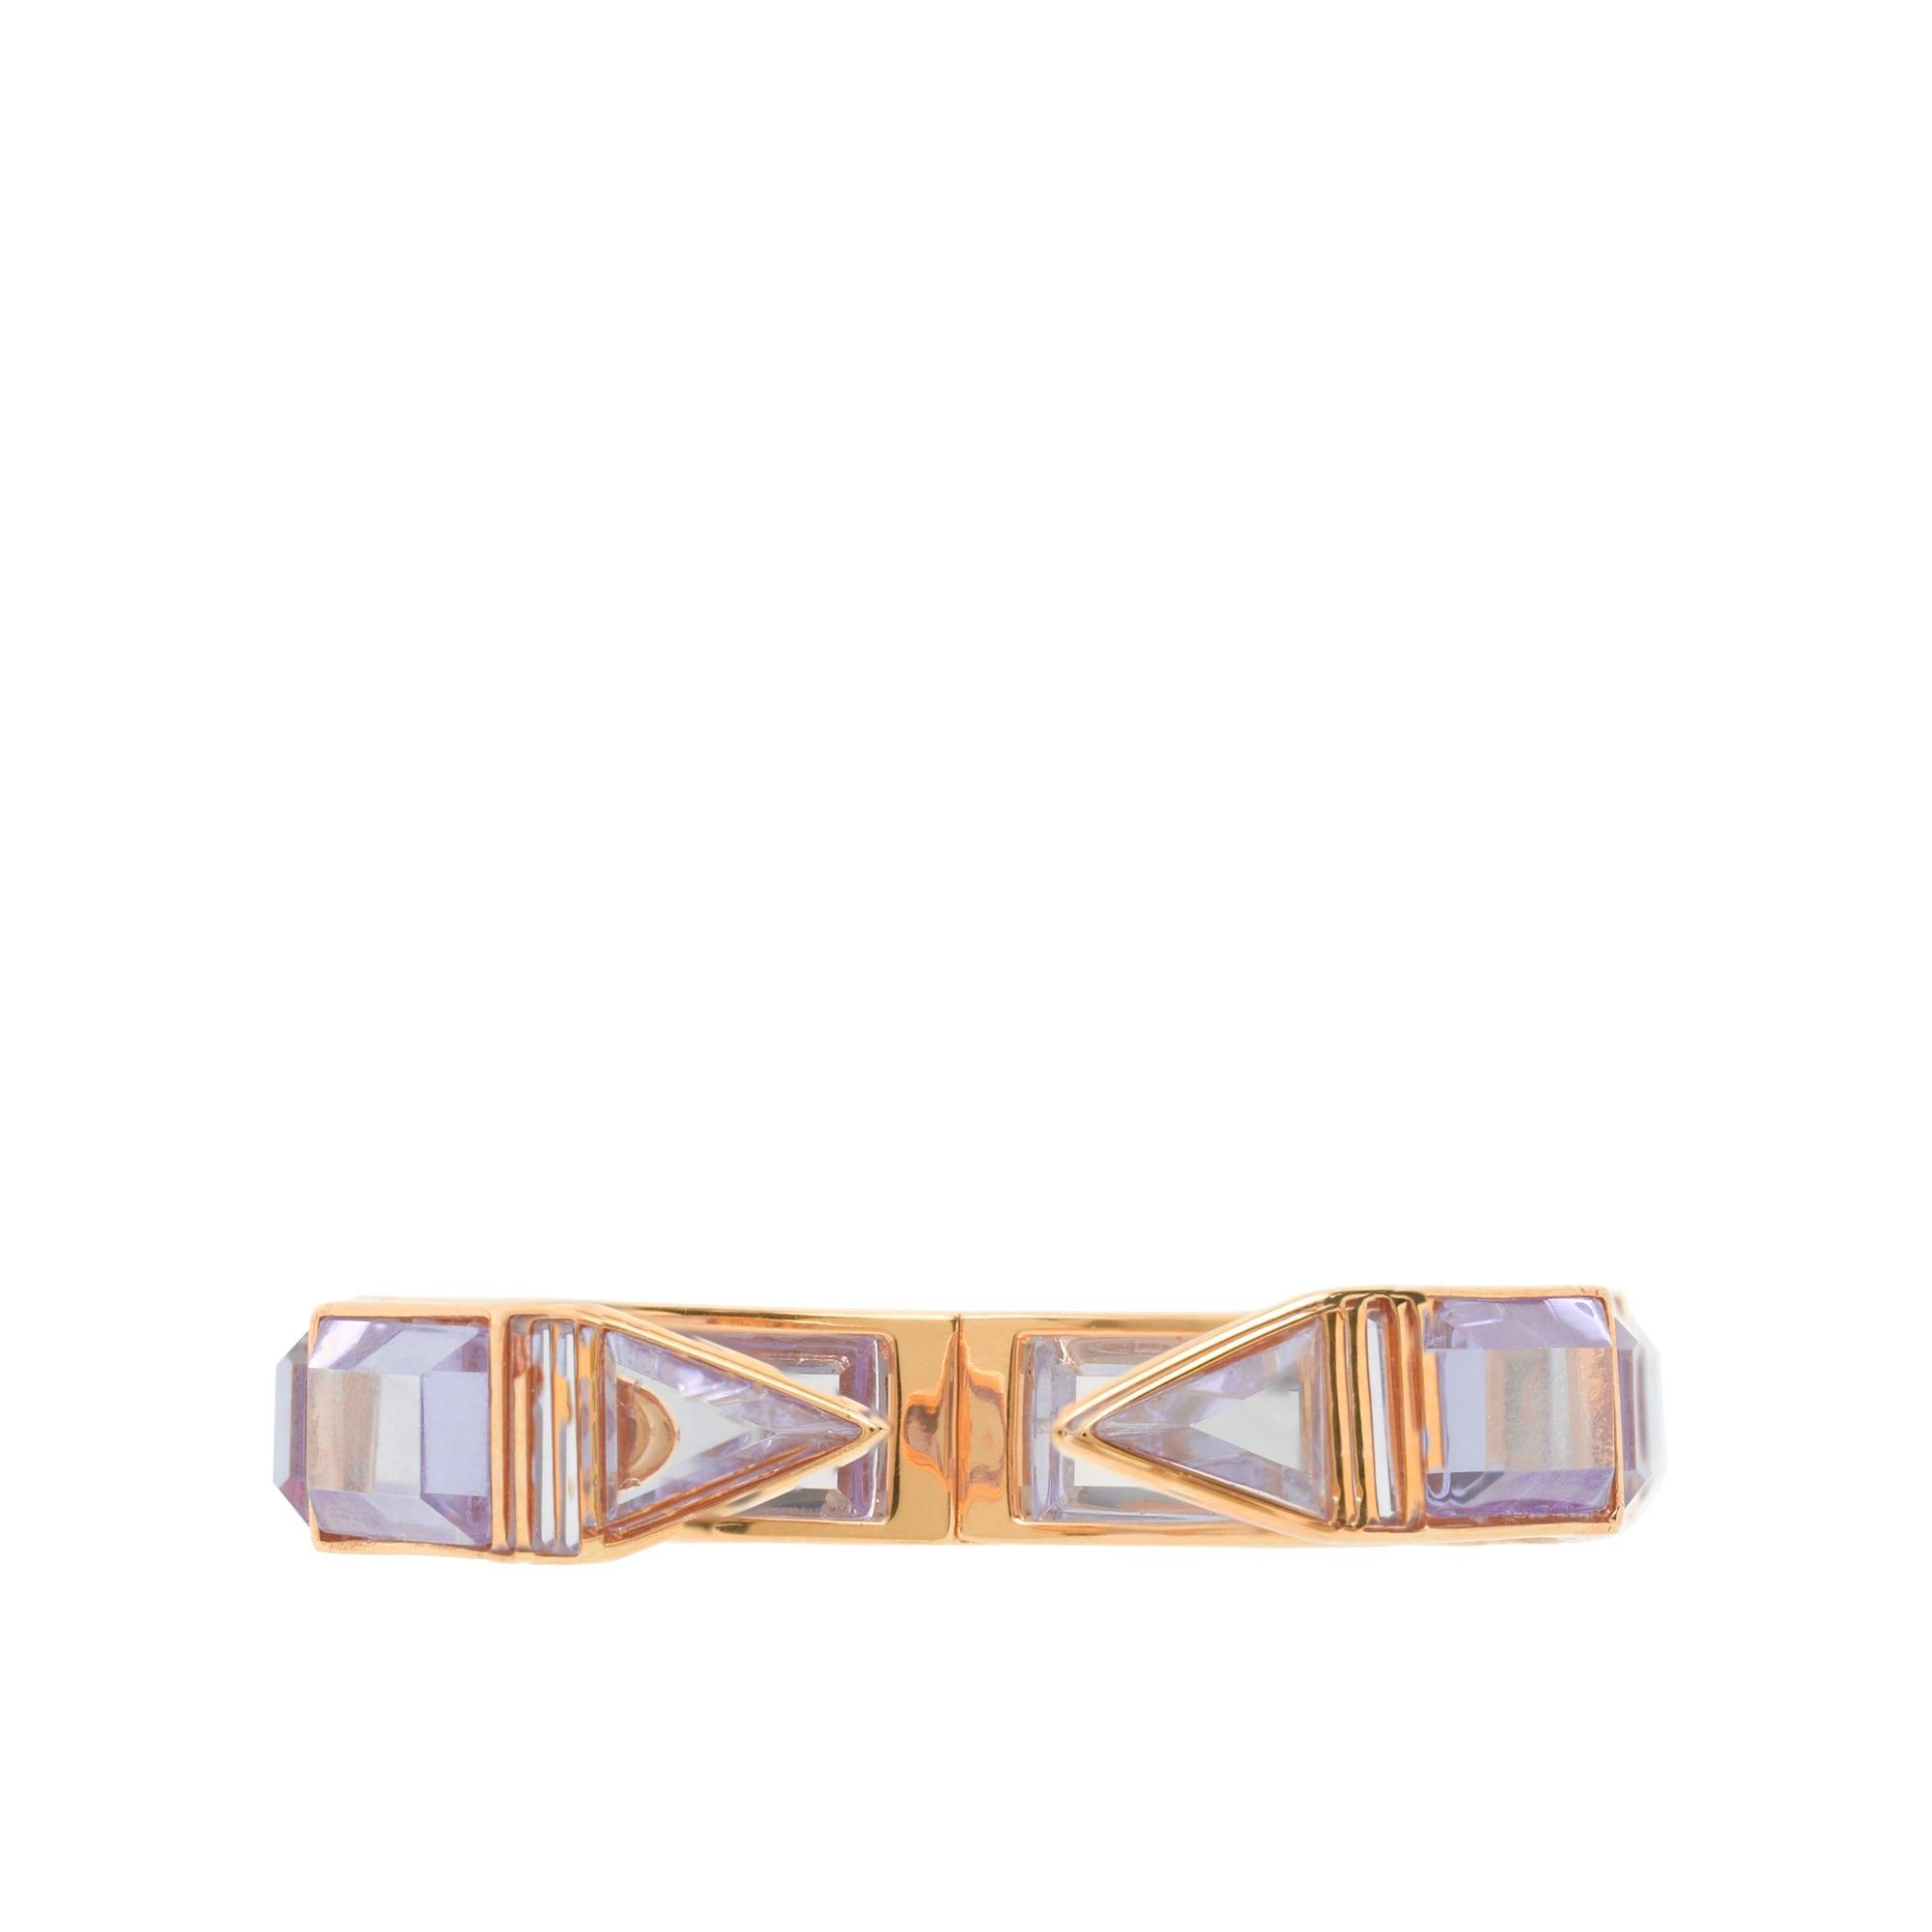 Jennifer Meyer for J.Crew Edith jeweled cuff